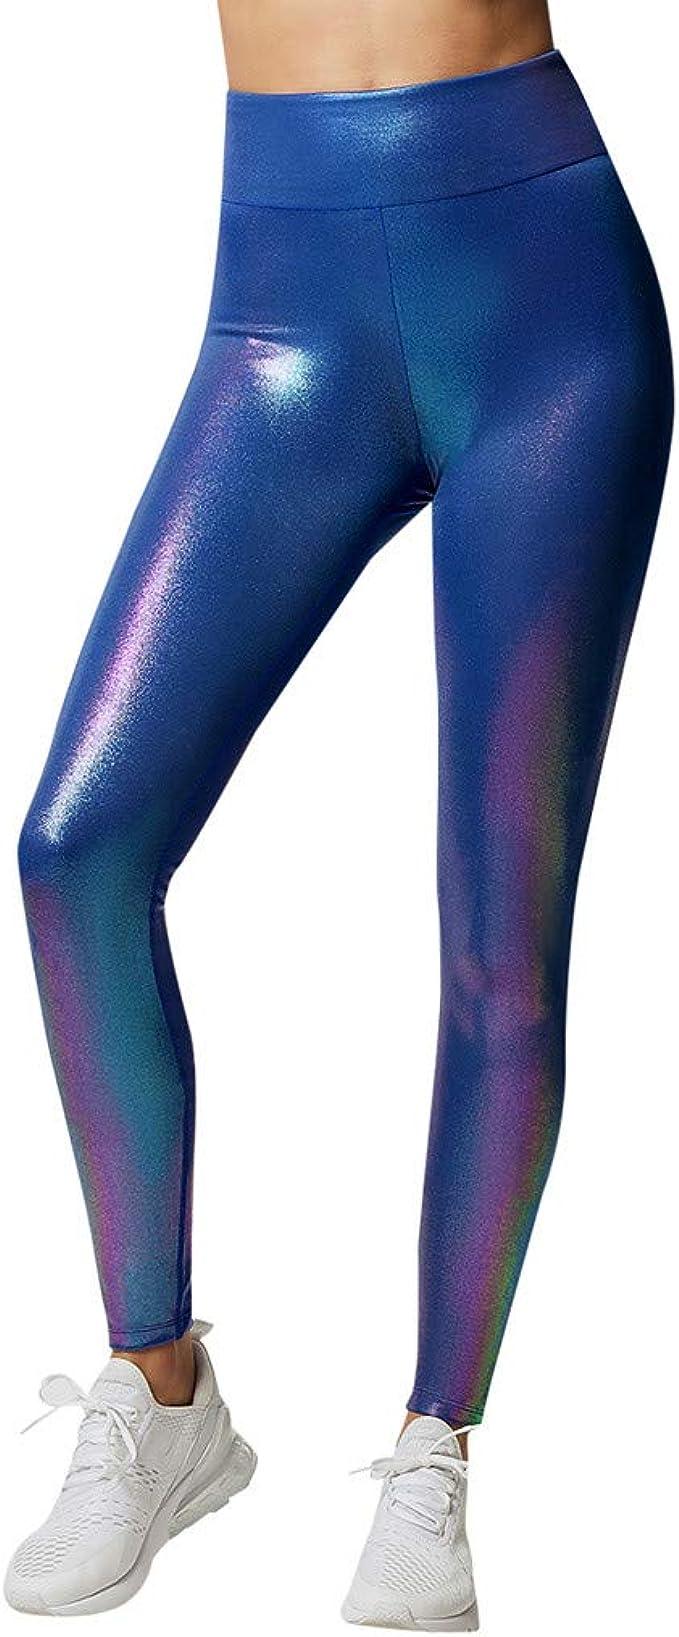 Pantalones Mujer Largos Deporte Verano Running Yoga PAOLIAN ...